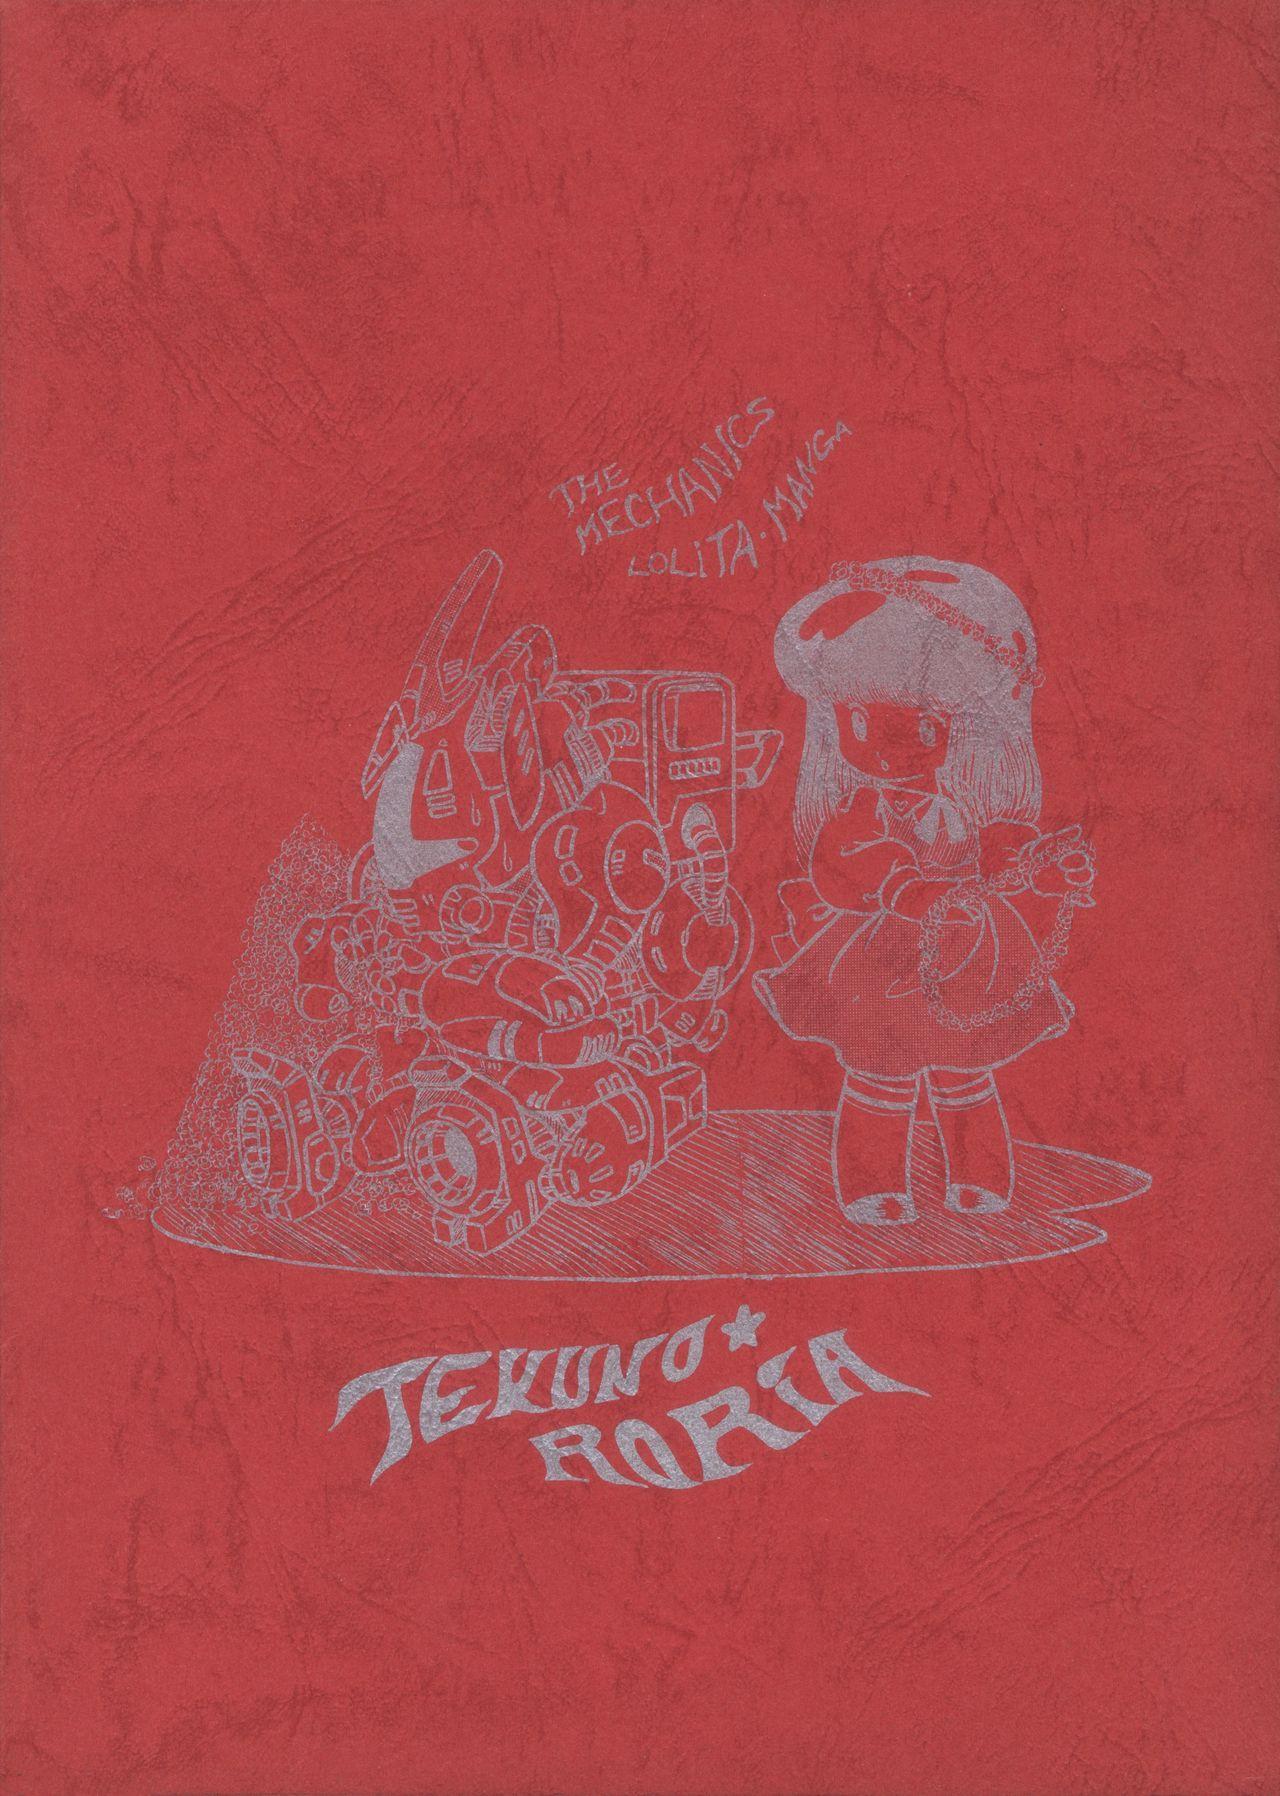 TEKUNO RORIA 97